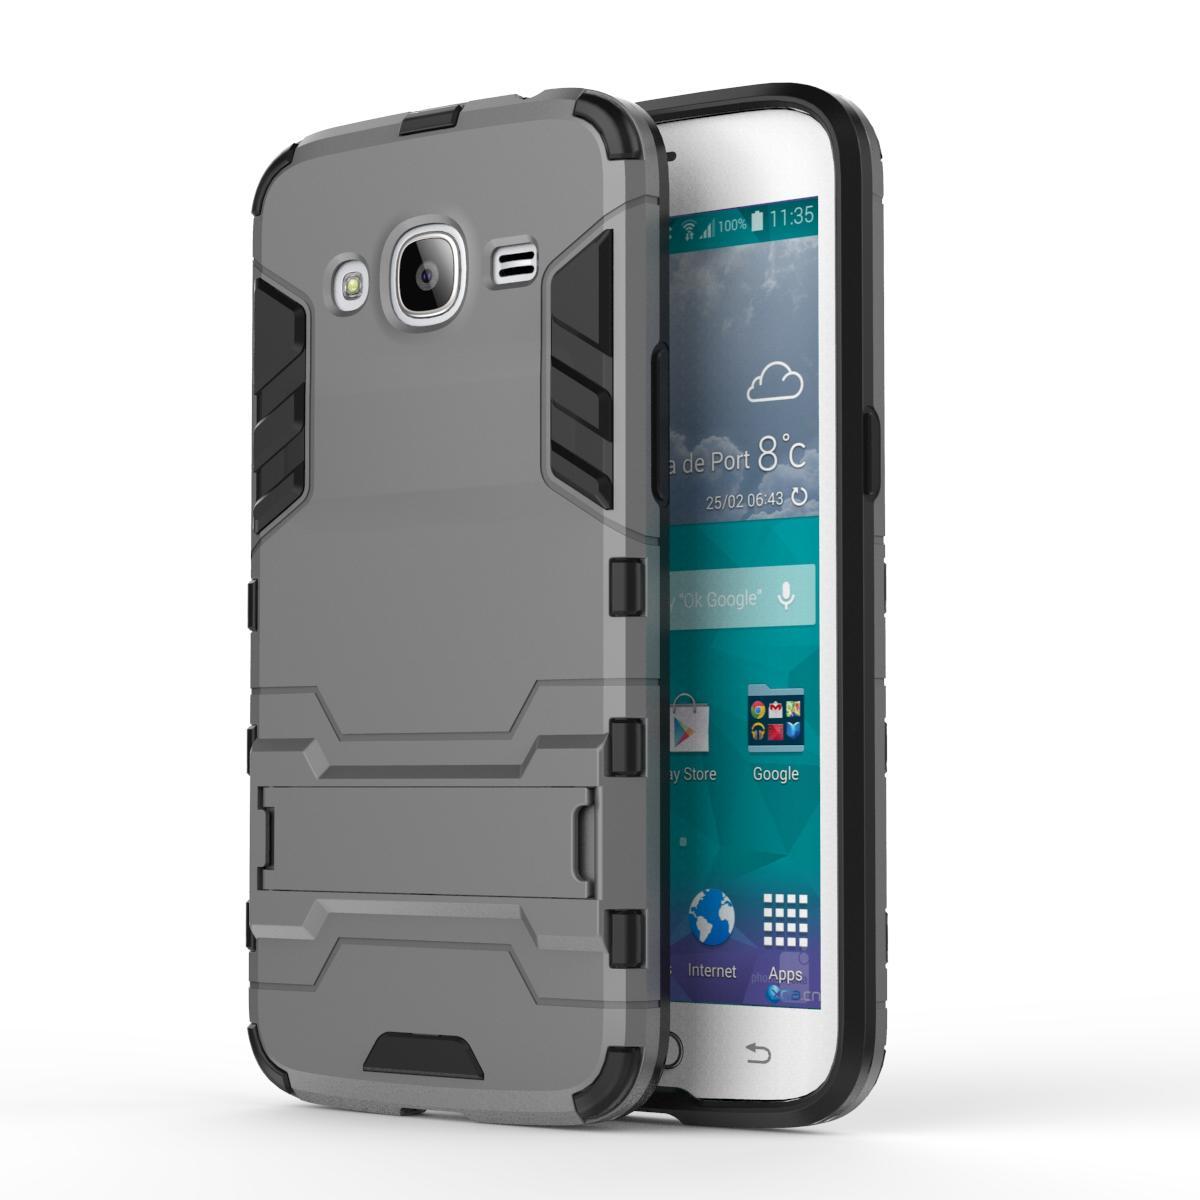 Shopping Comparison For Samsung Galaxy J2 2016 Case J210 J210F Slim Hard Back CoverShockproof Robot Armor Silicone Phone Case For Samsung J2 2016 -intl